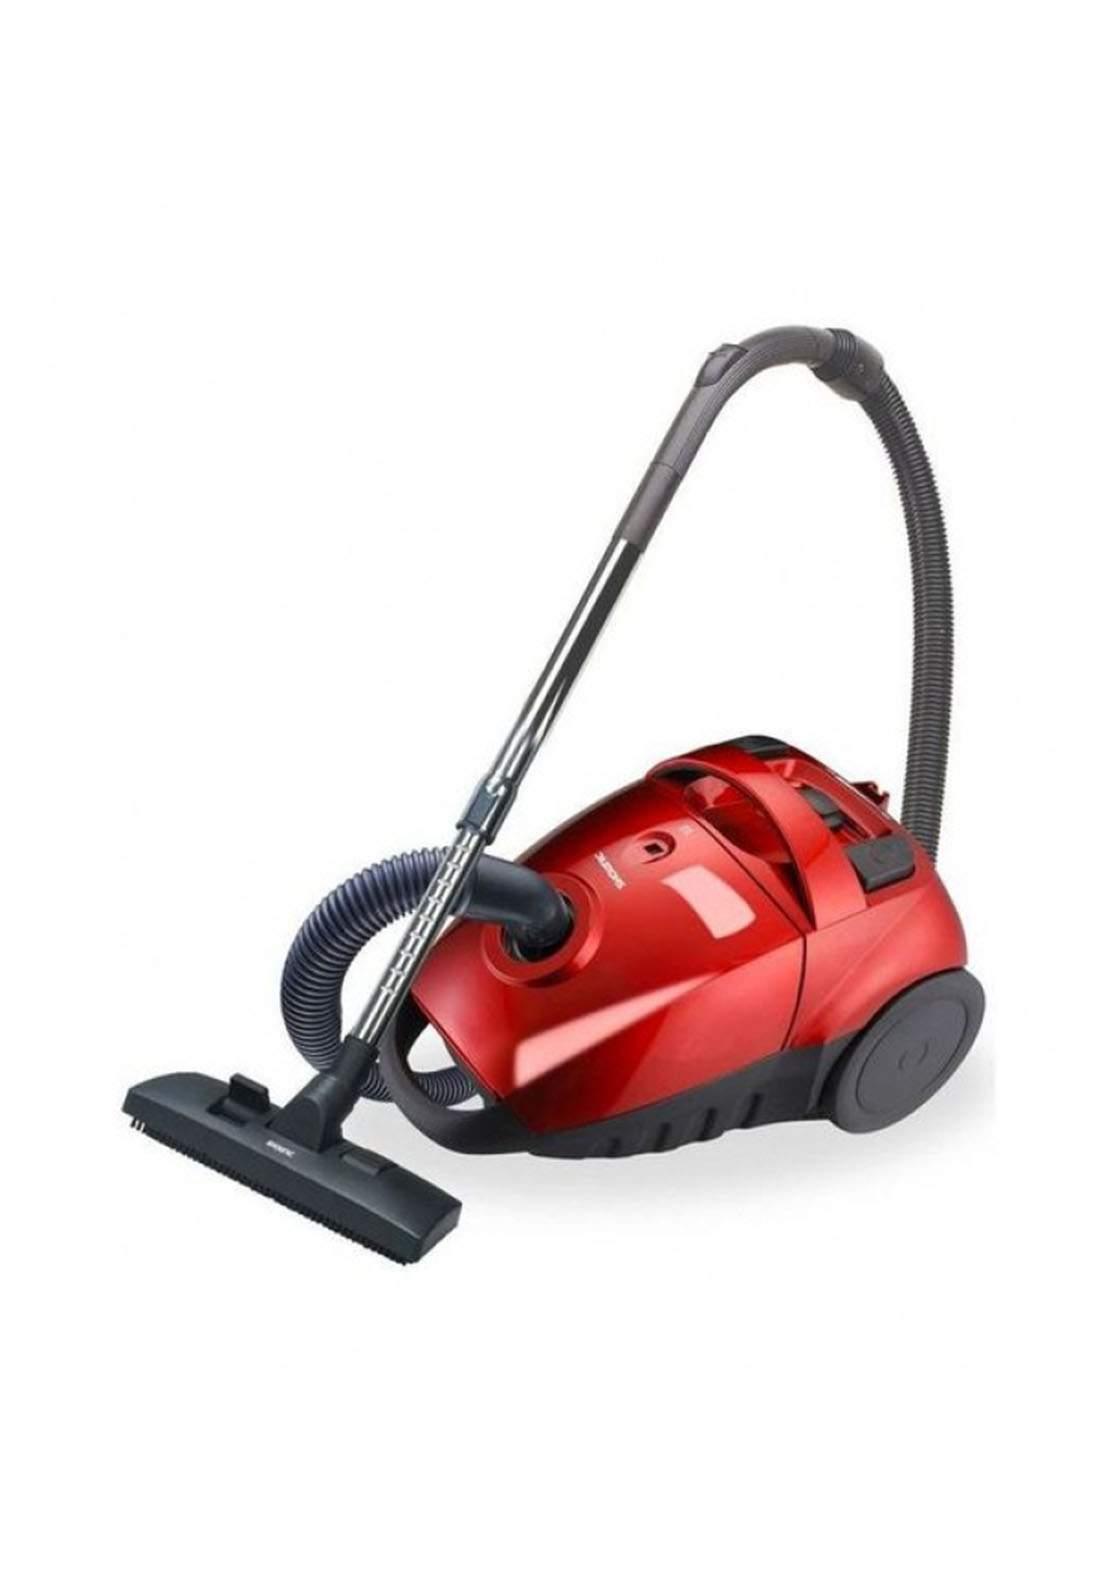 Schunk 03e16vc Vacuum Cleaner With Bag مكنسة كهربائية